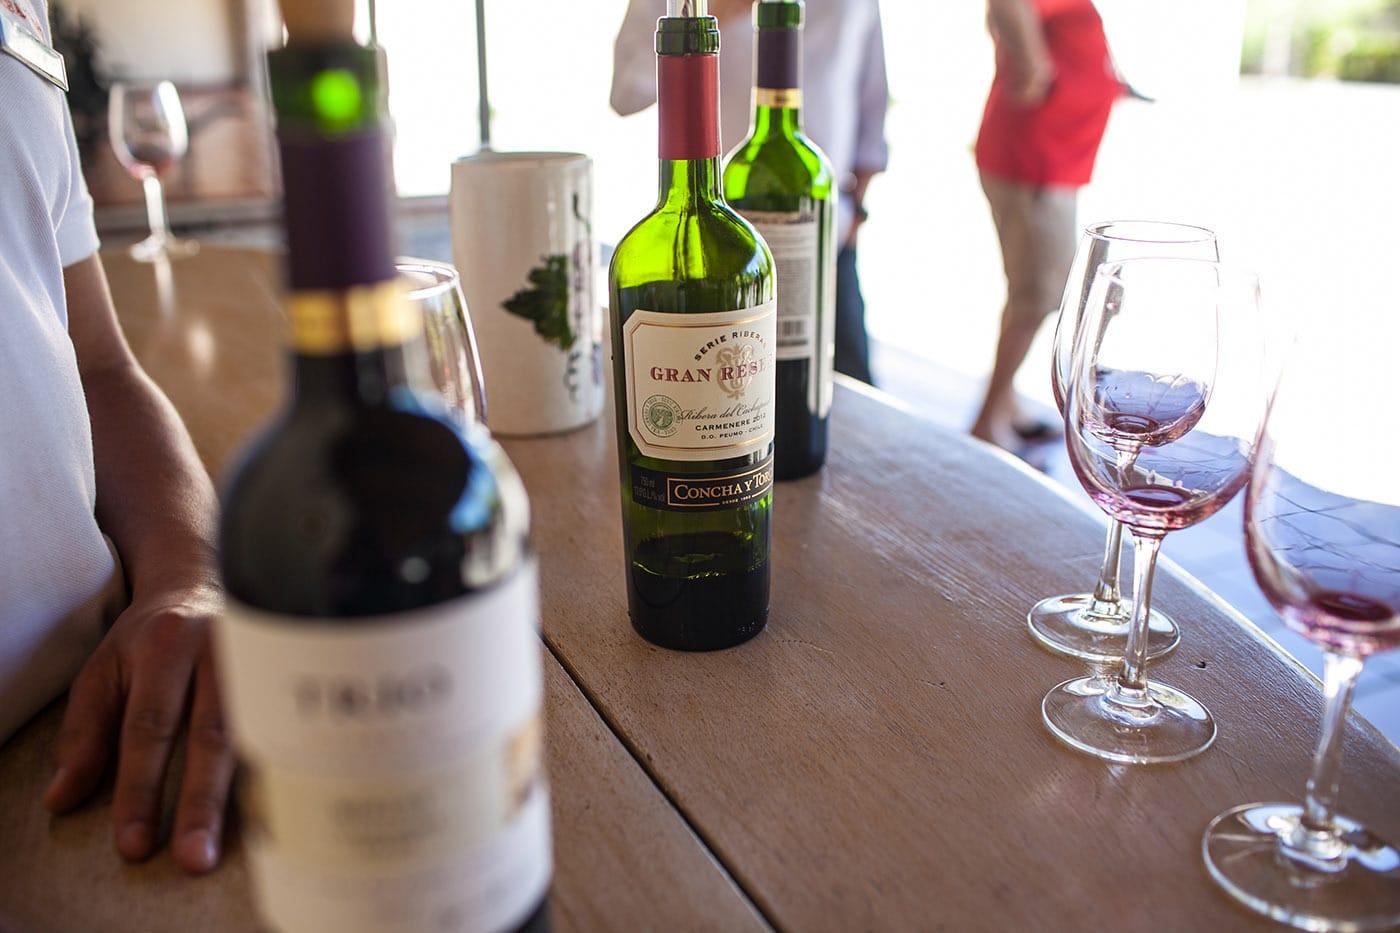 Concha y Toro wine tour in Santiago, Chile